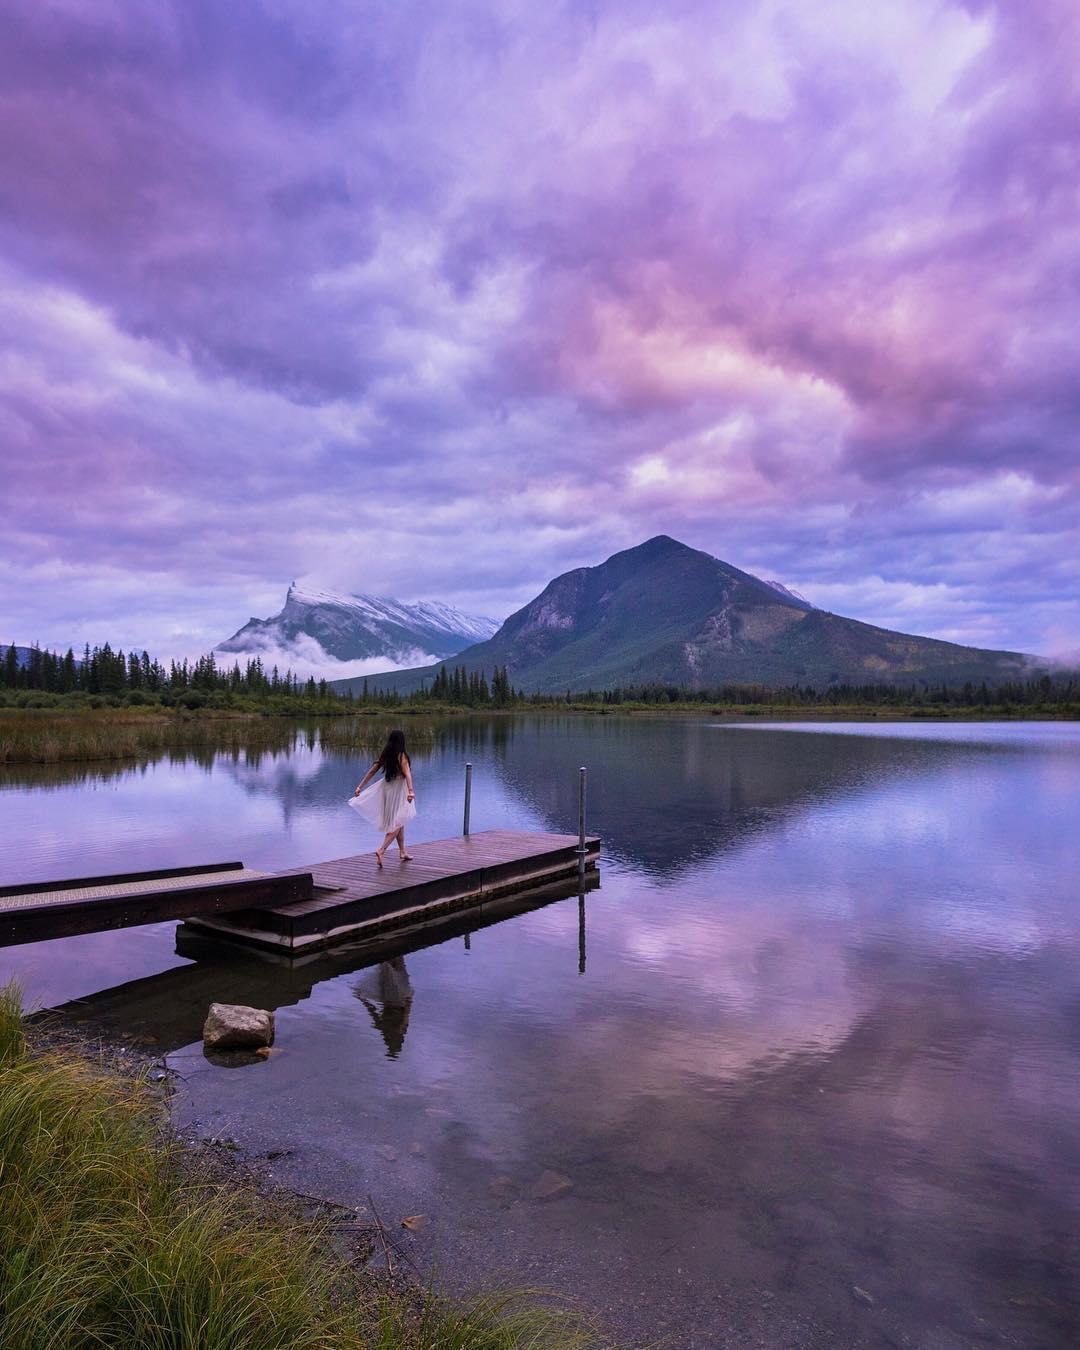 Природа и приключения на снимках Кайла Хубера